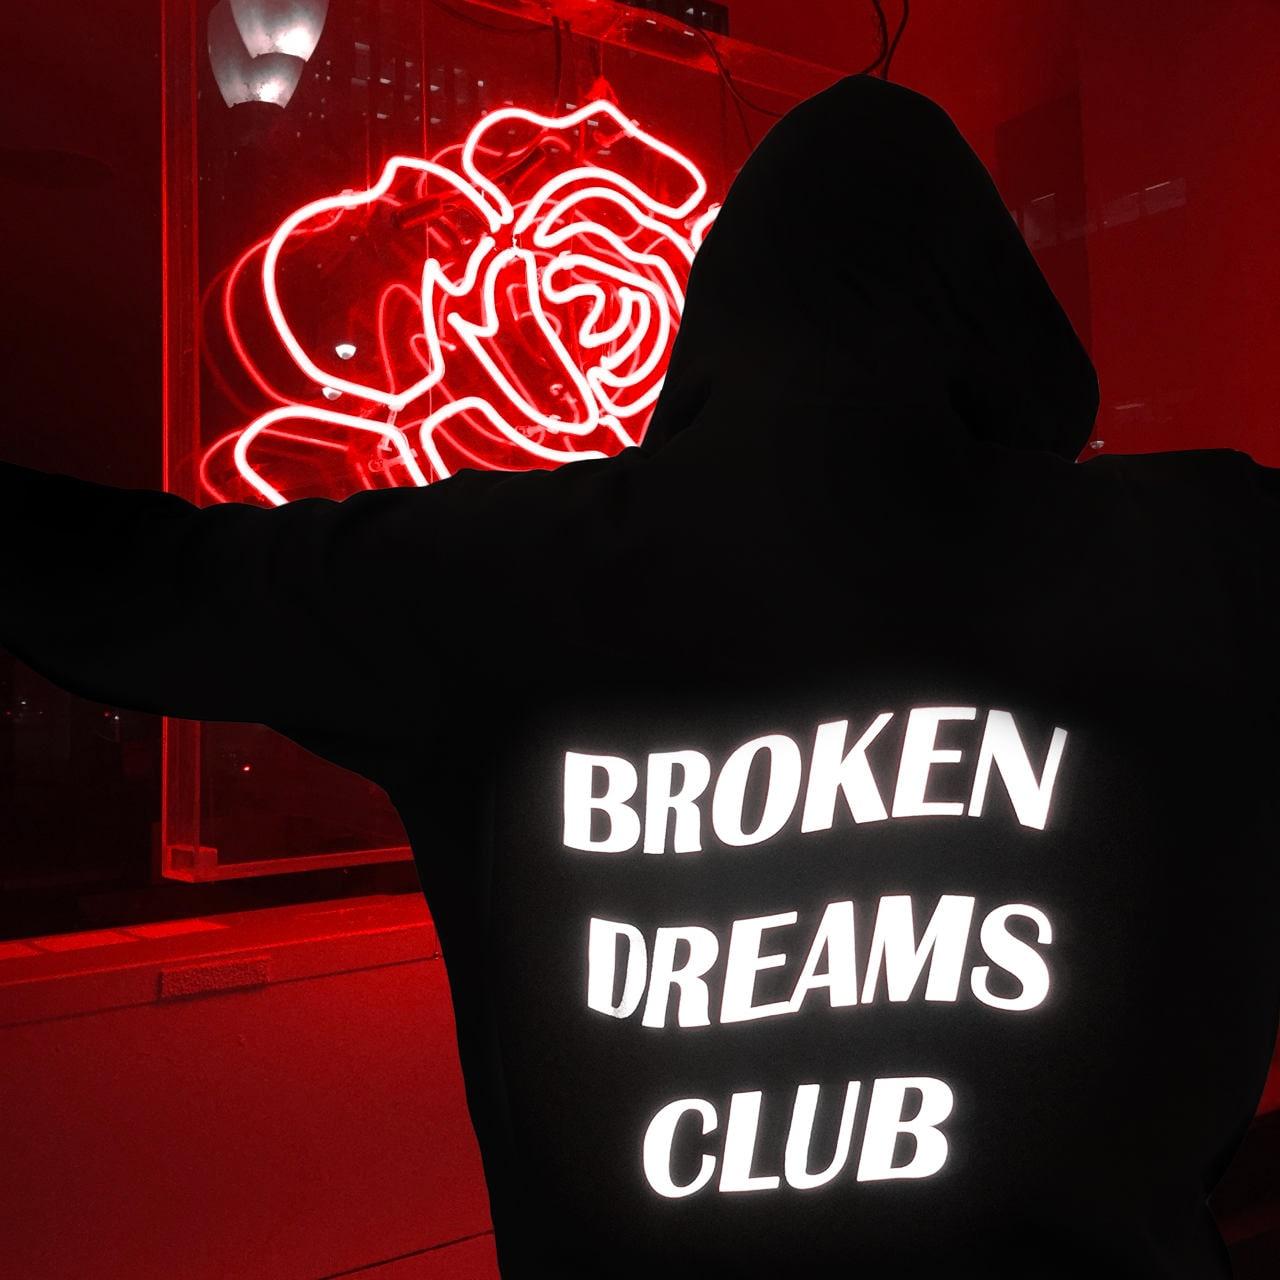 Broken Dreams Club Reflective Hoodie Black Tumblr Inspired